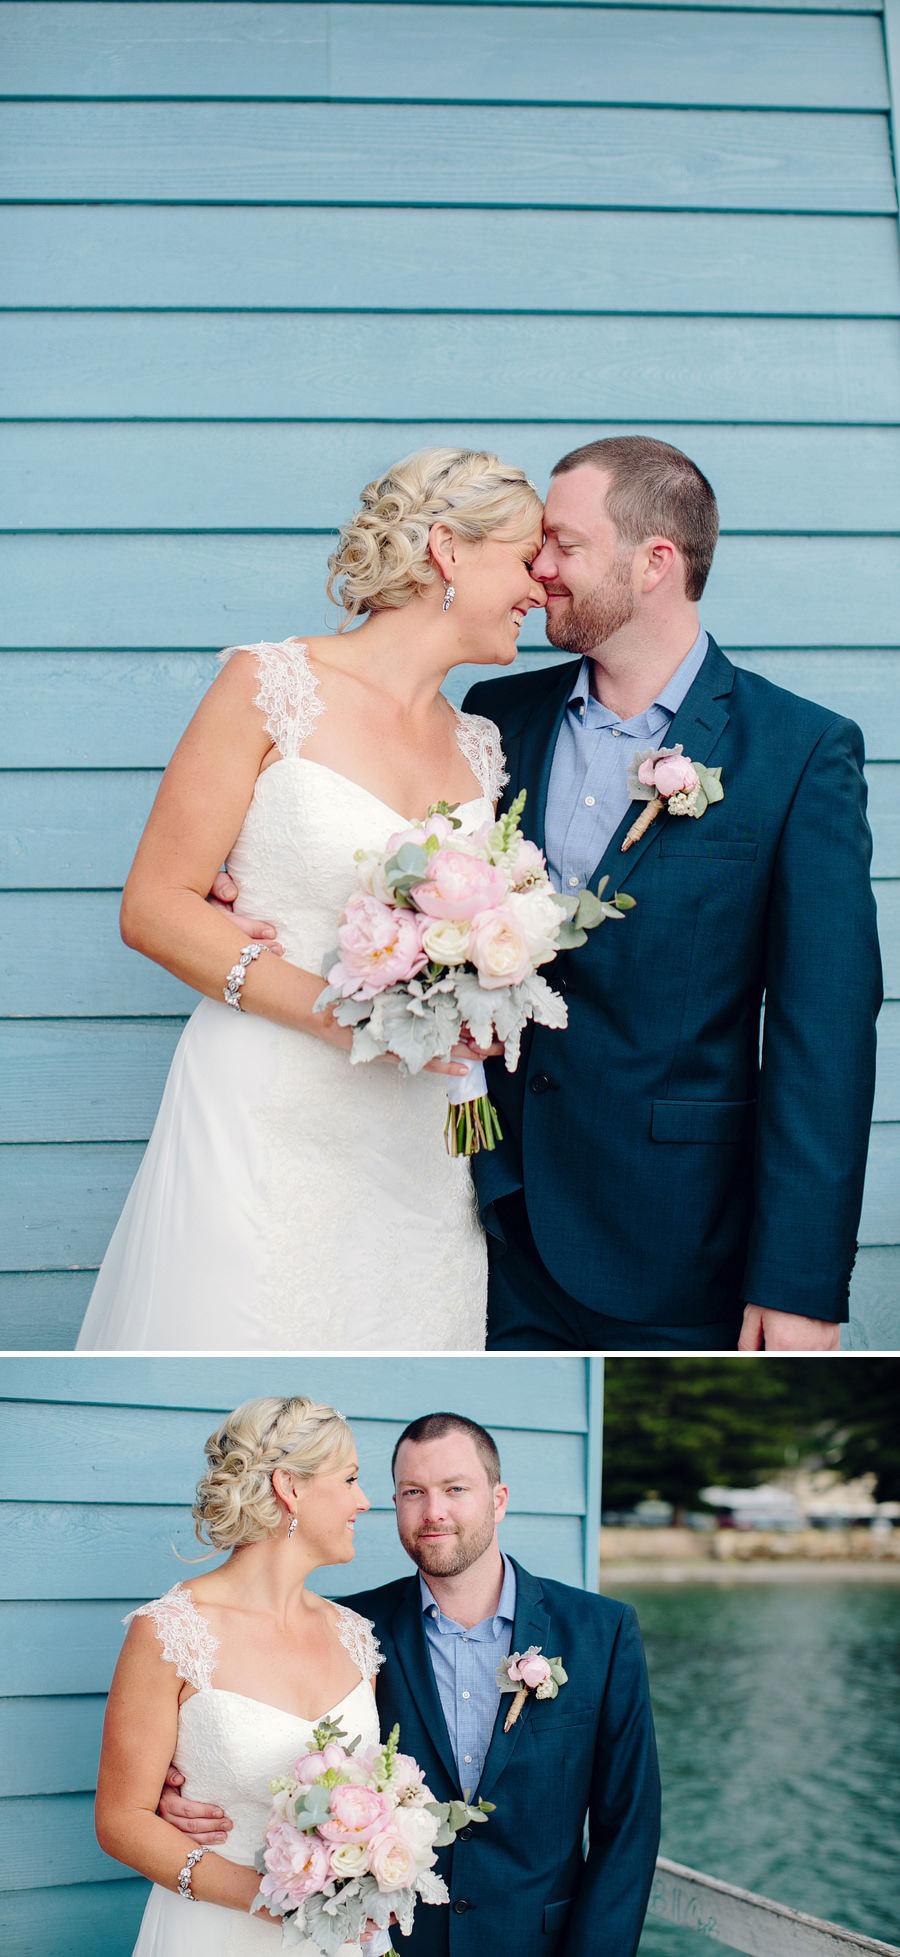 Northern Beaches Wedding Photographers: Bridal Party Portraits